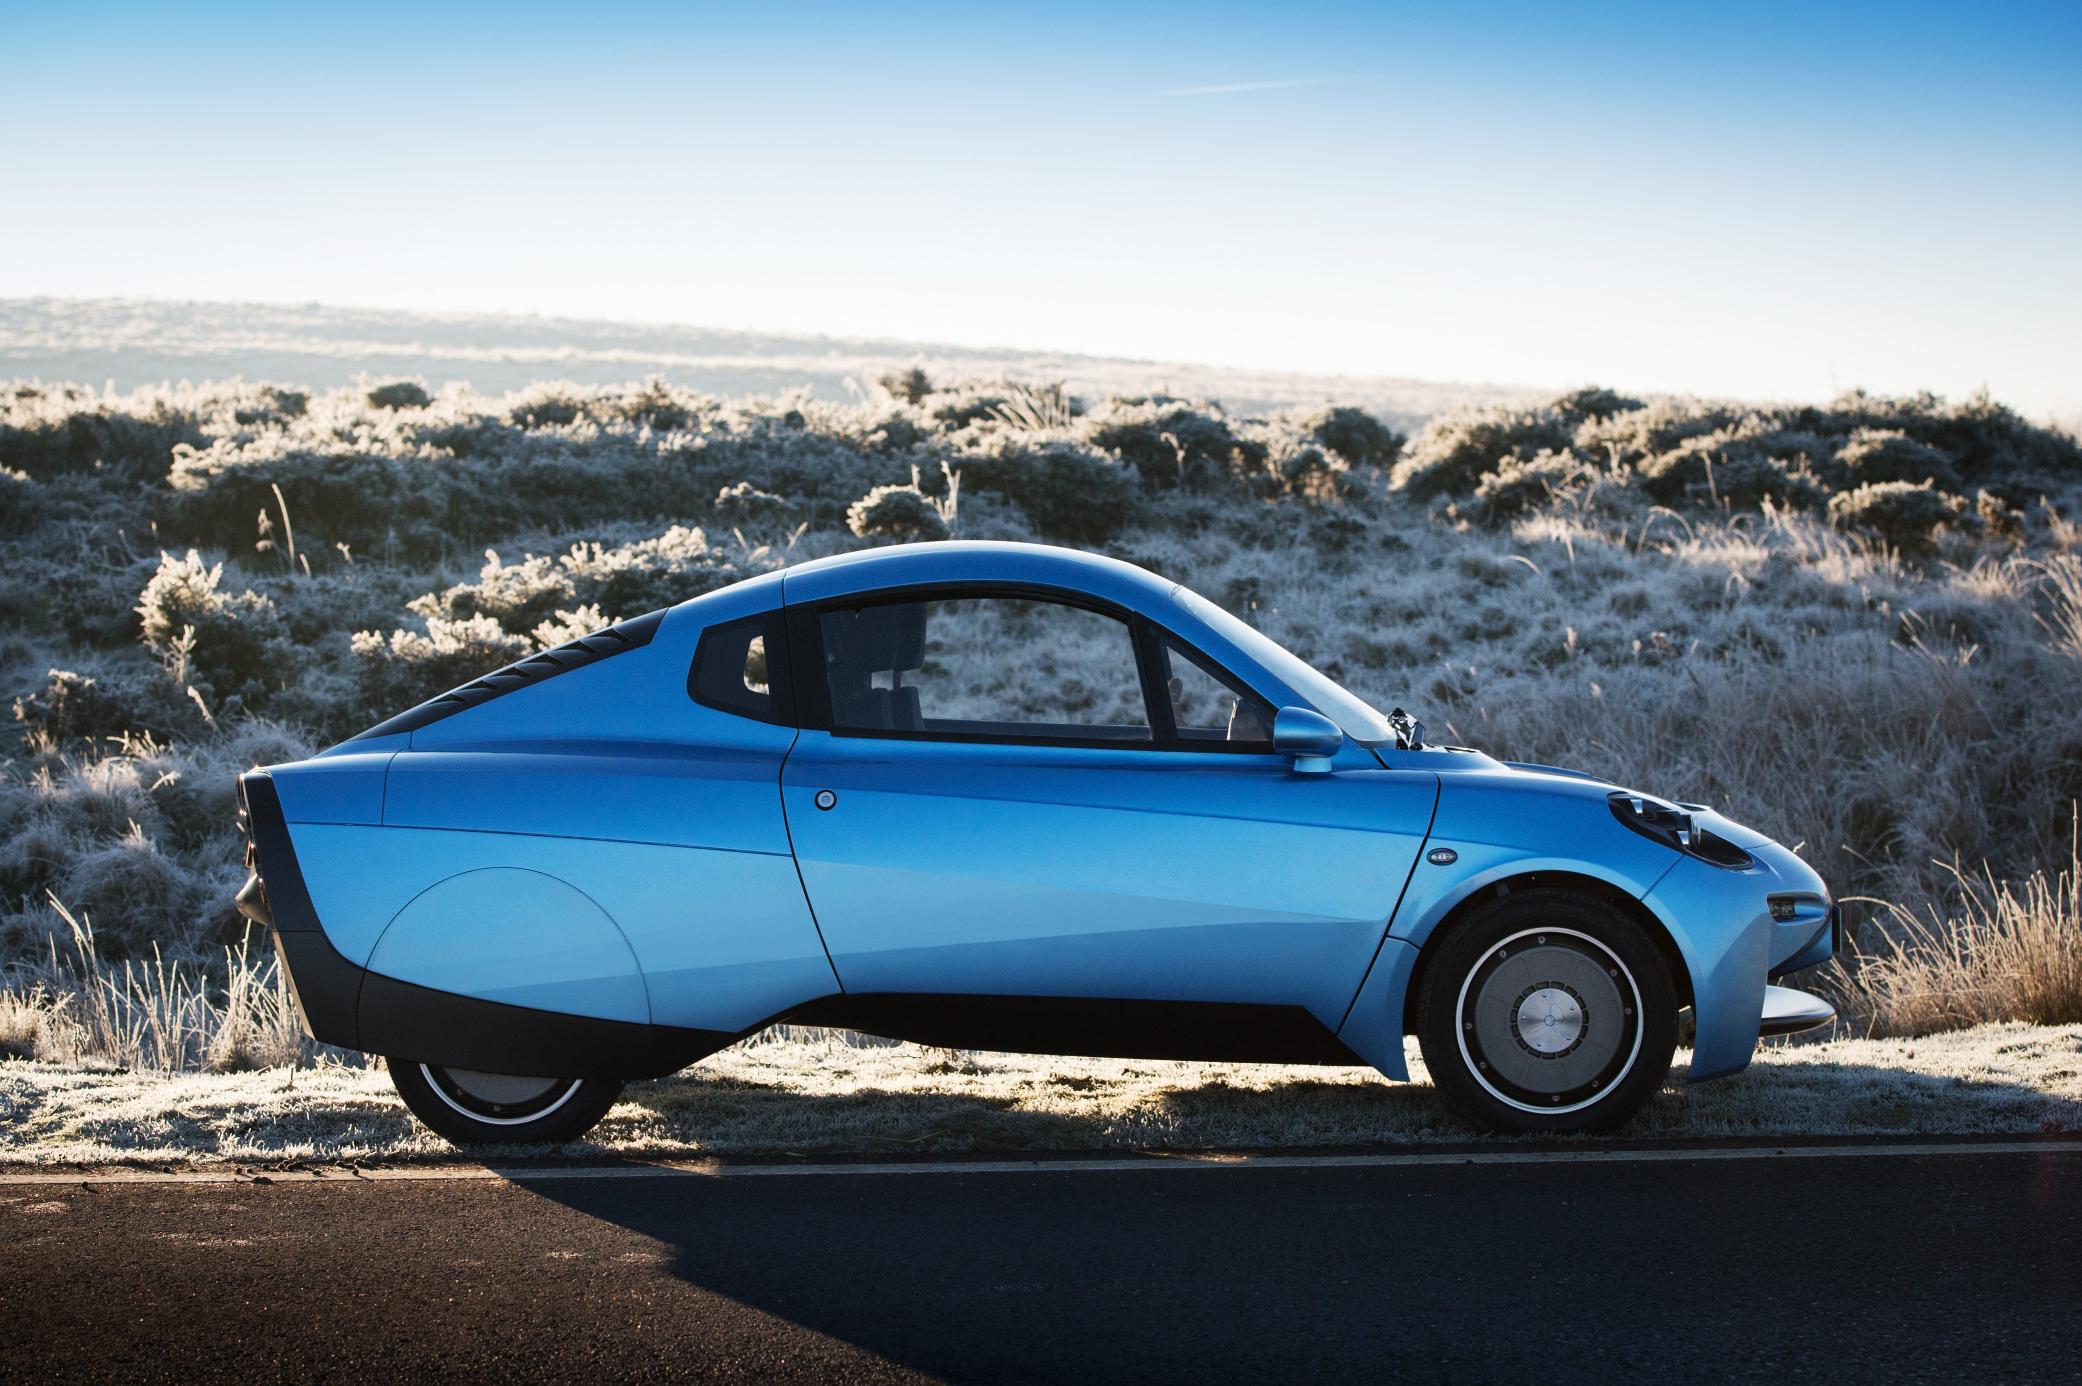 Riversimple Rasa lightweight hydrogen car nudged toward production with Siemens partnership